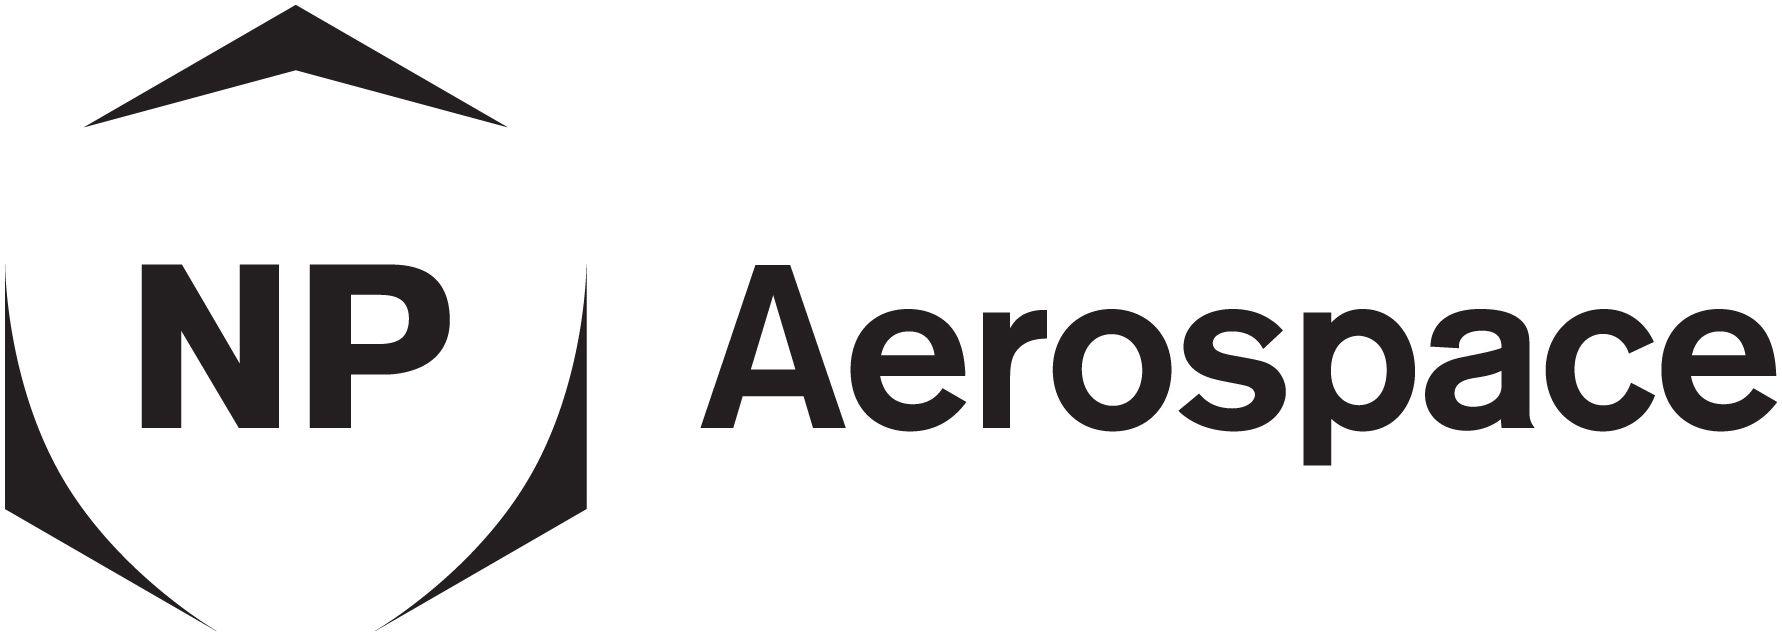 N P Aerospace